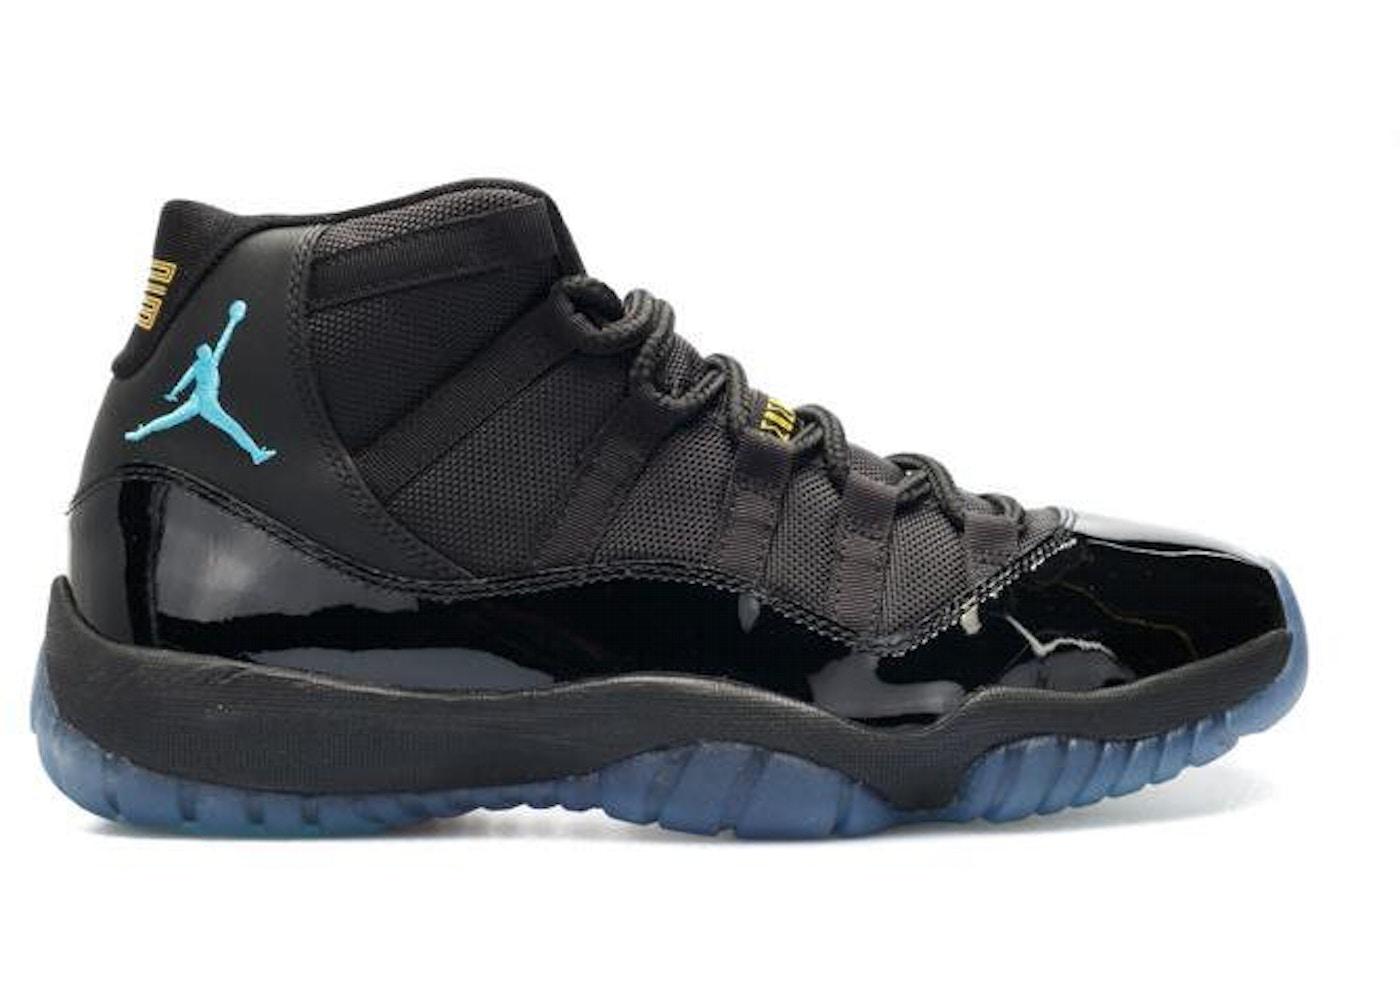 100% authentic bc523 bb878 Buy Air Jordan 11 Shoes   Deadstock Sneakers